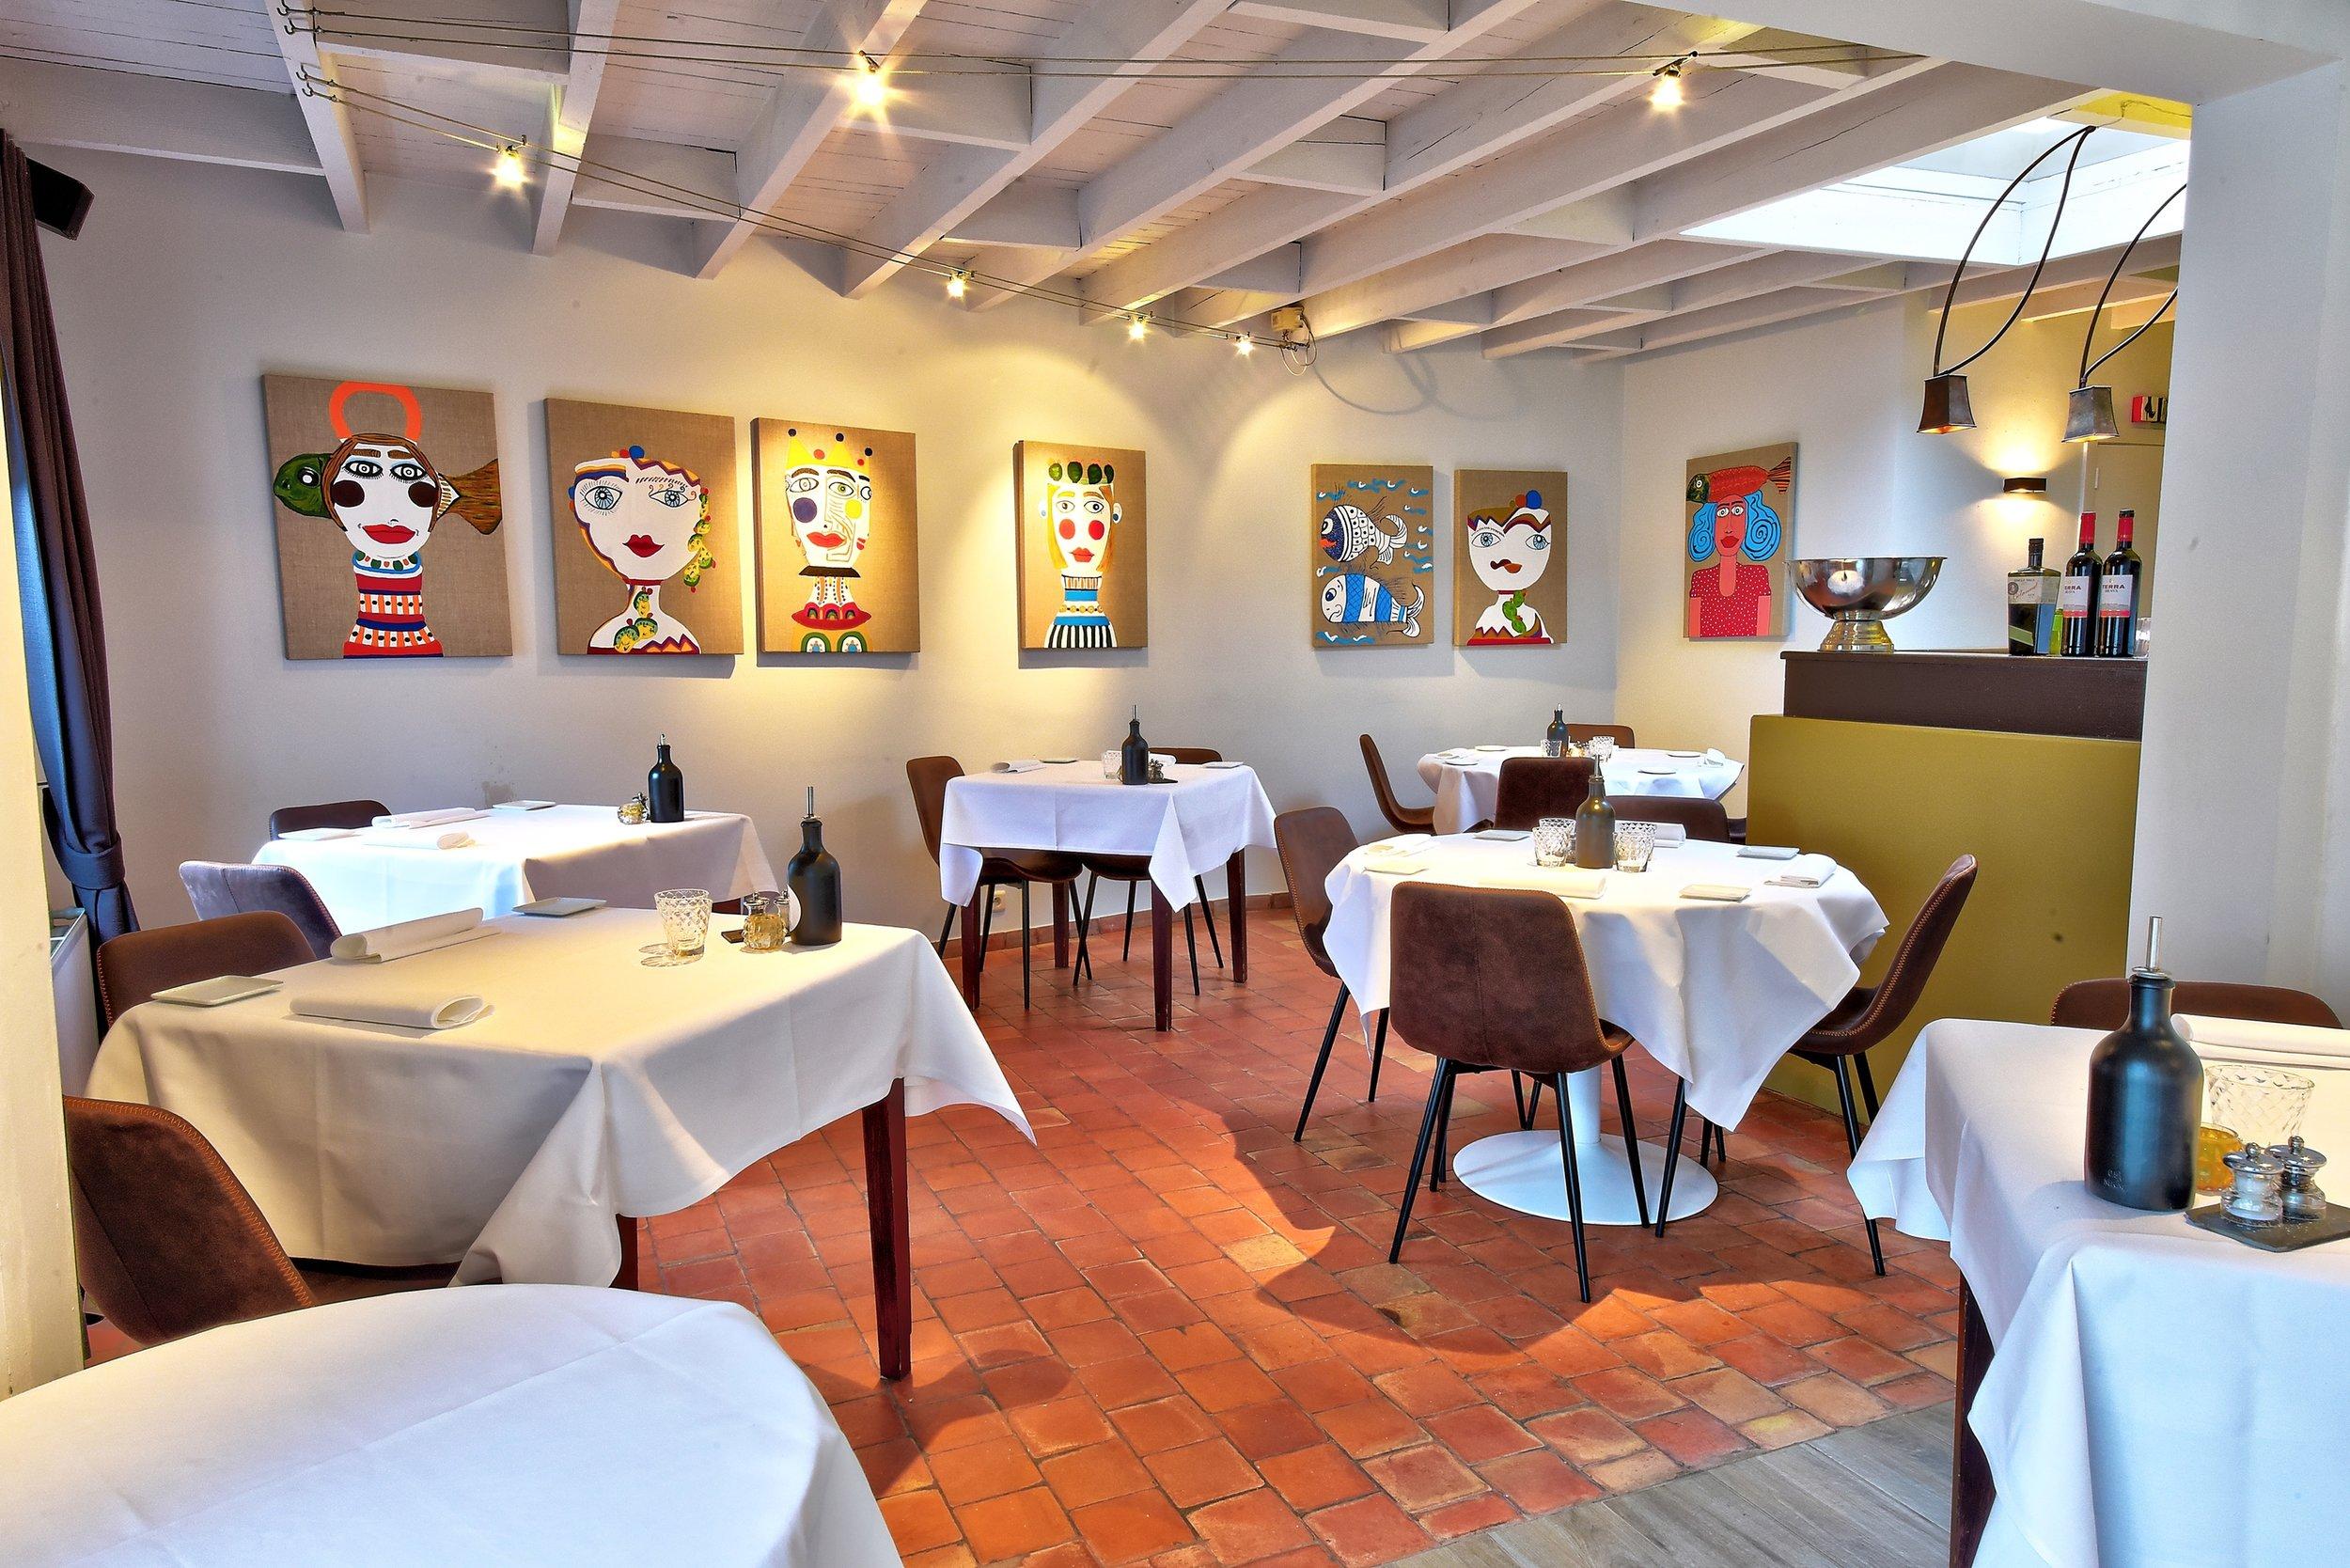 bouffard restaurant mol bart albrecht tablefever food fotograaf.0005.jpg